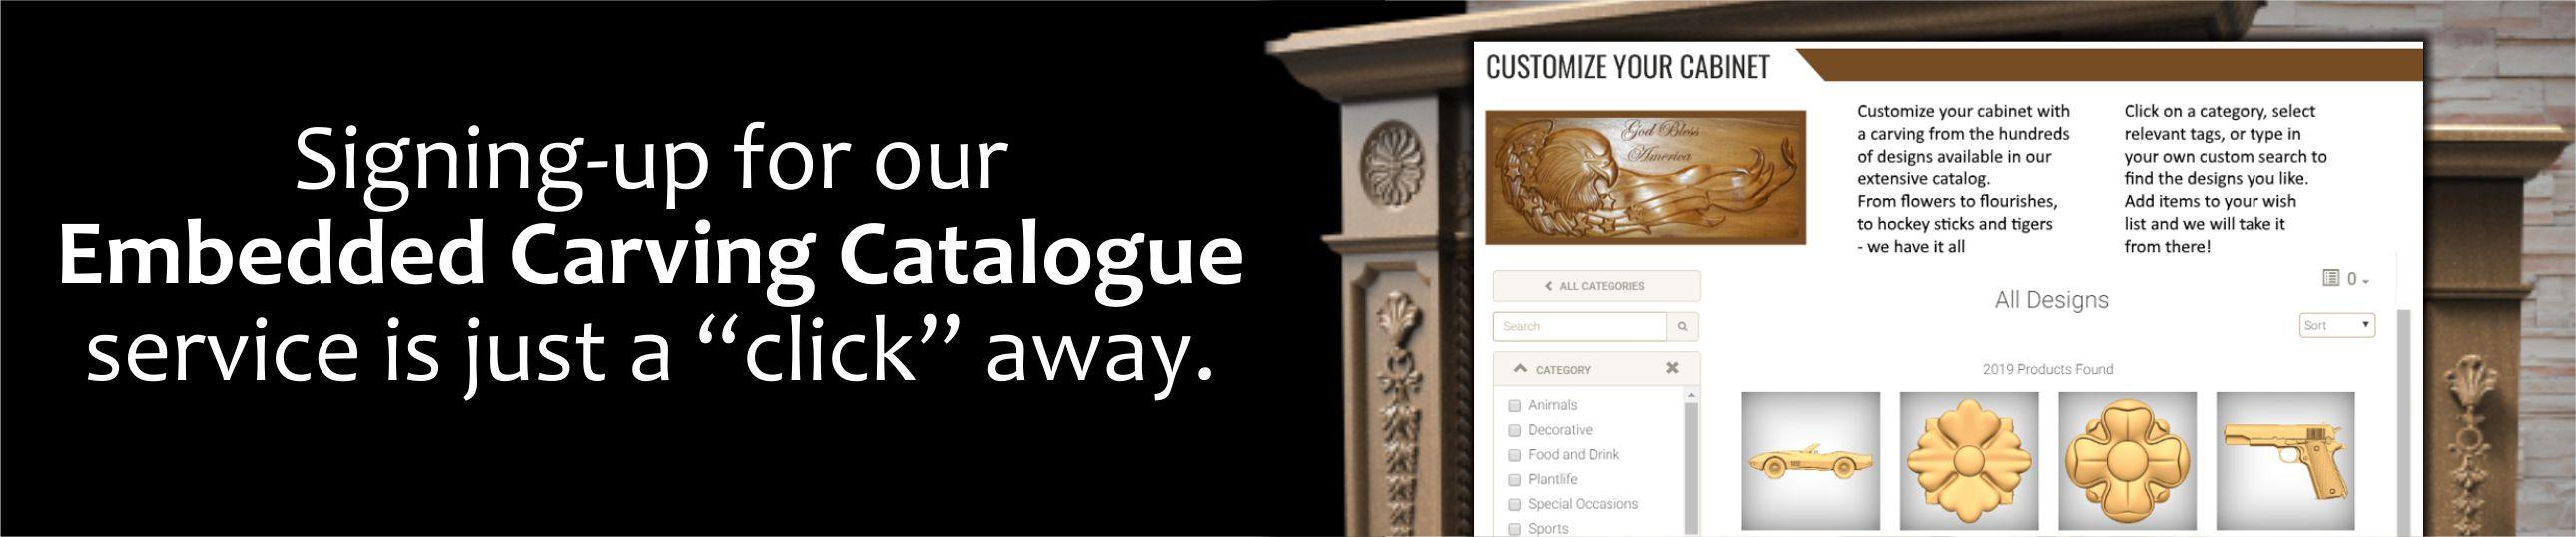 Embedded Carving Catalog